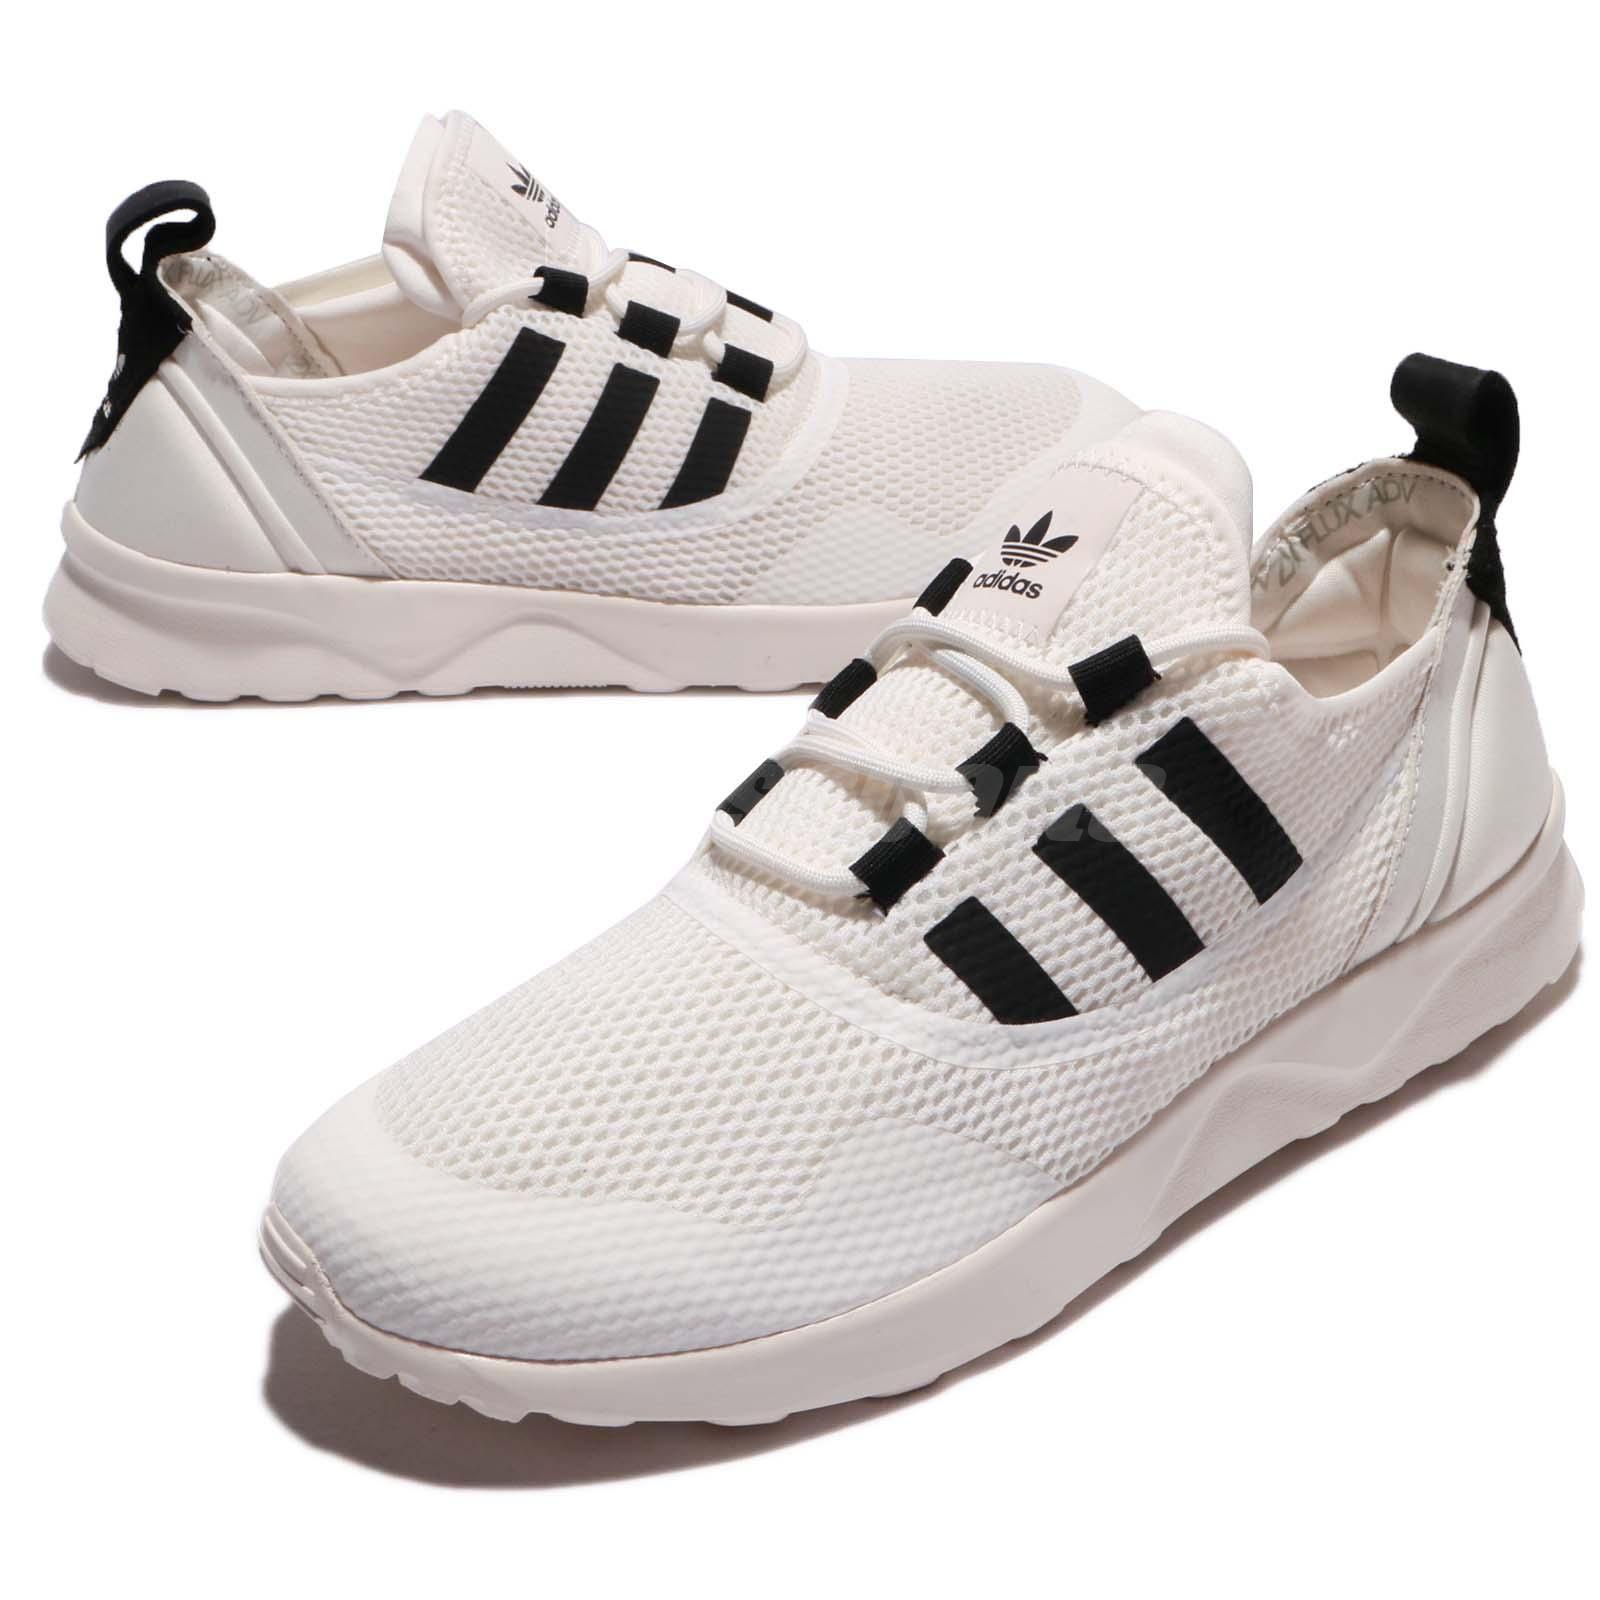 new release big sale super specials Details about adidas Originals ZX Flux ADV Virtue W White Black Women  Running Shoes CP9883